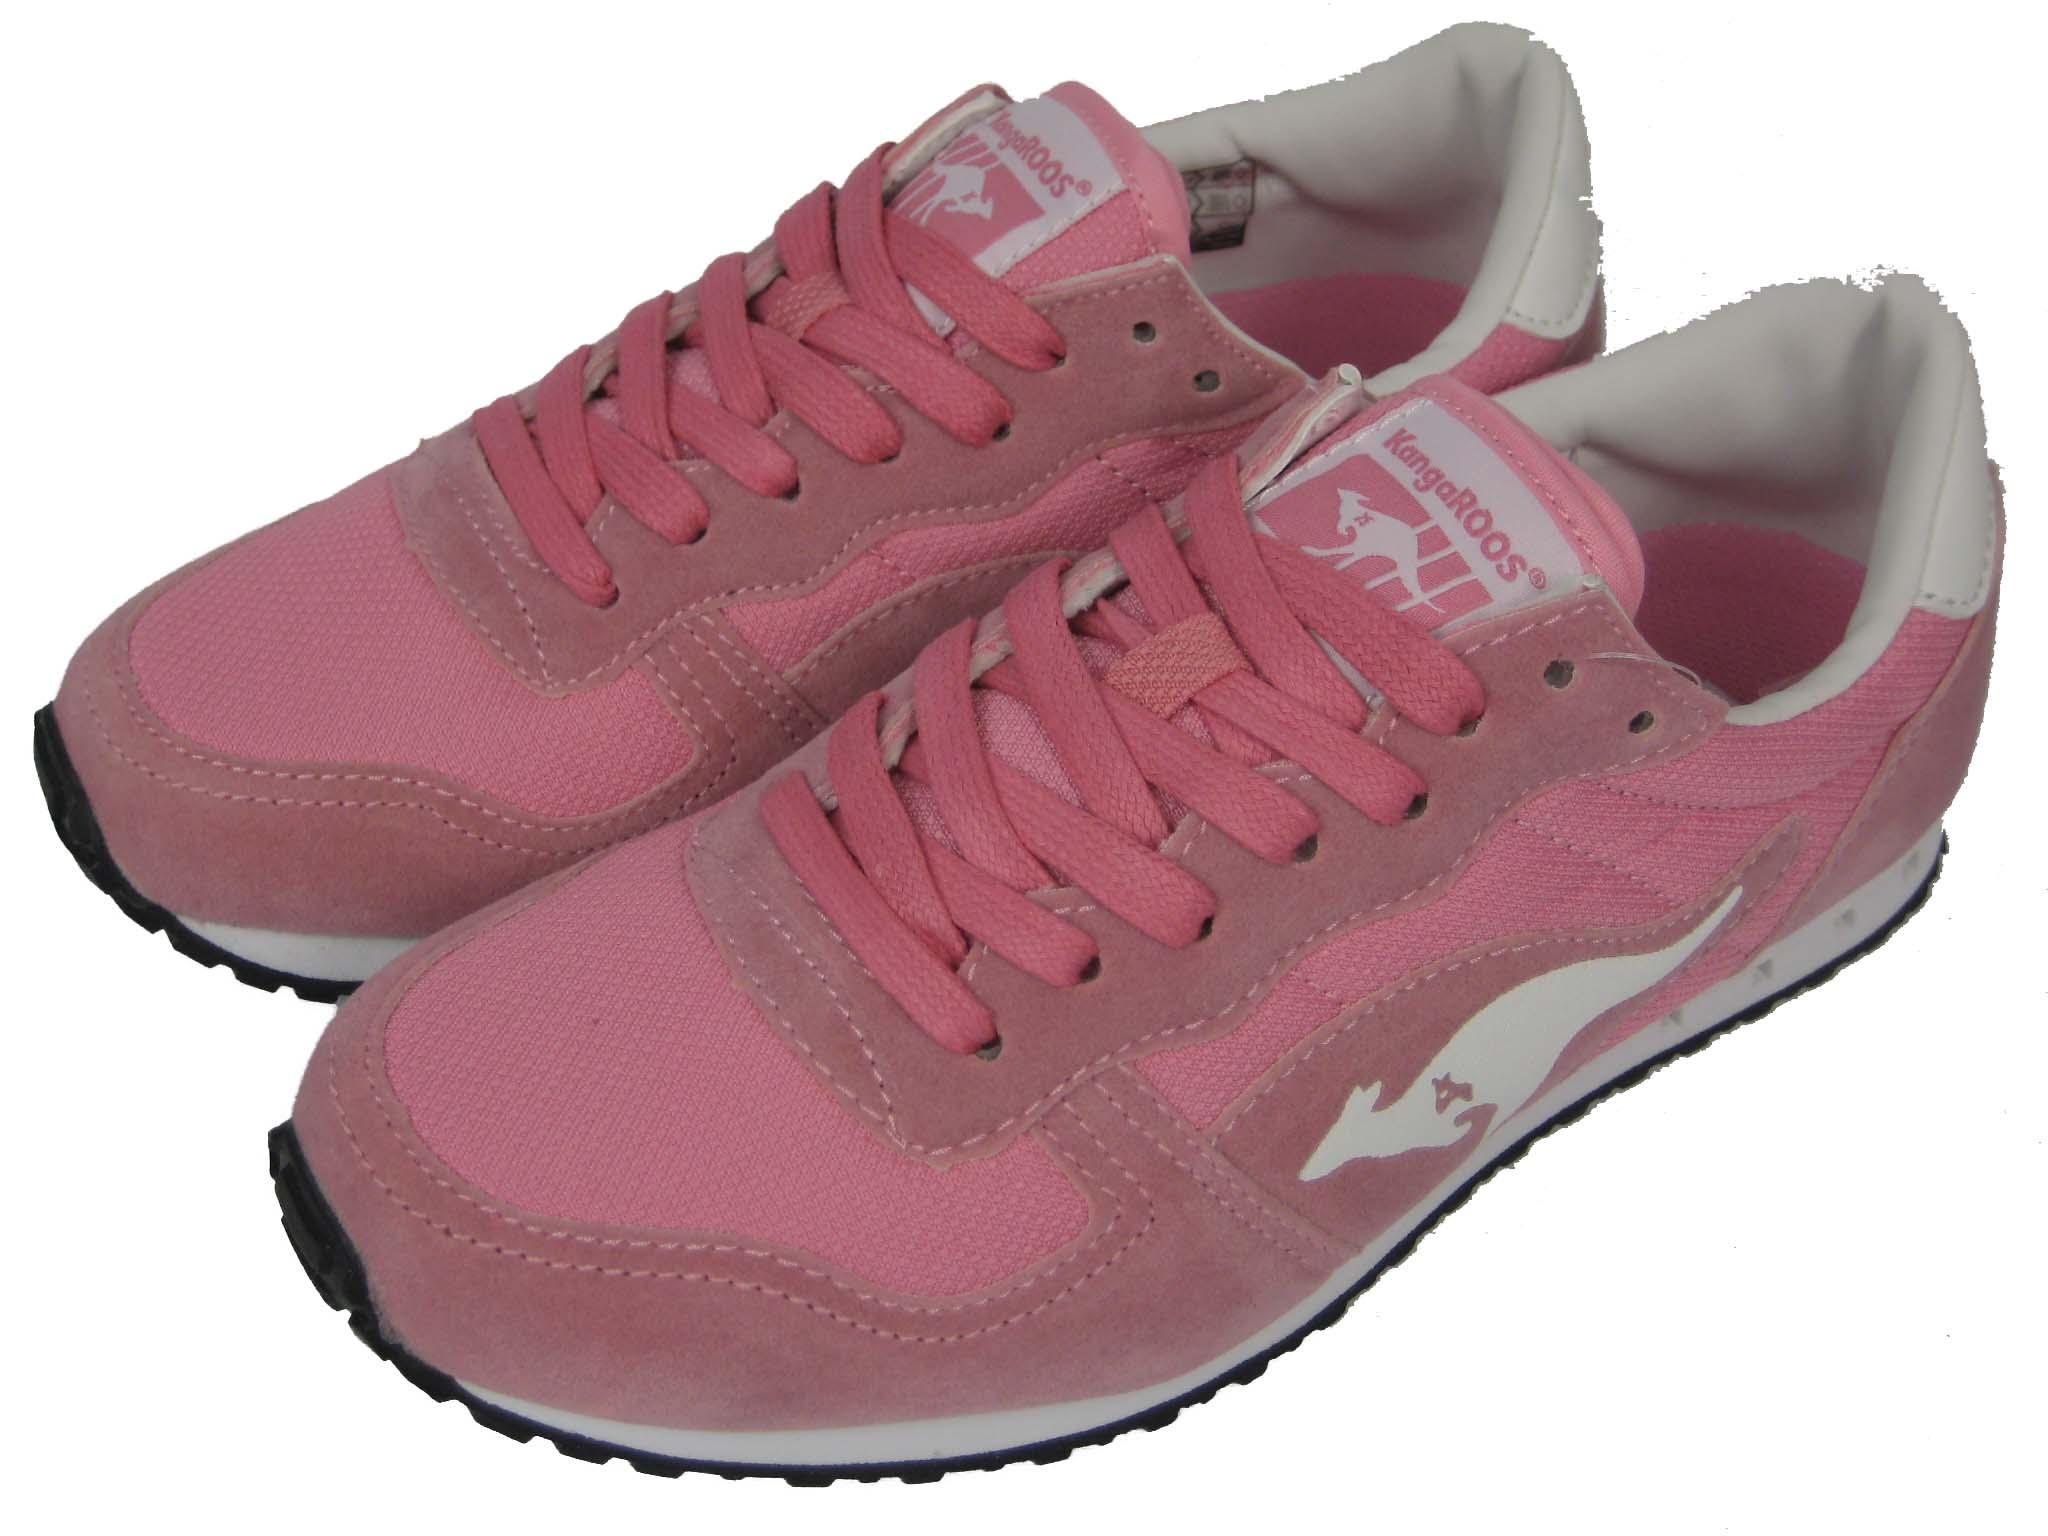 Sneaker Blaze Kangaroos Weiss Schuh Rosa Iii Pink Damen Laufschuh White EHeYD29IWb